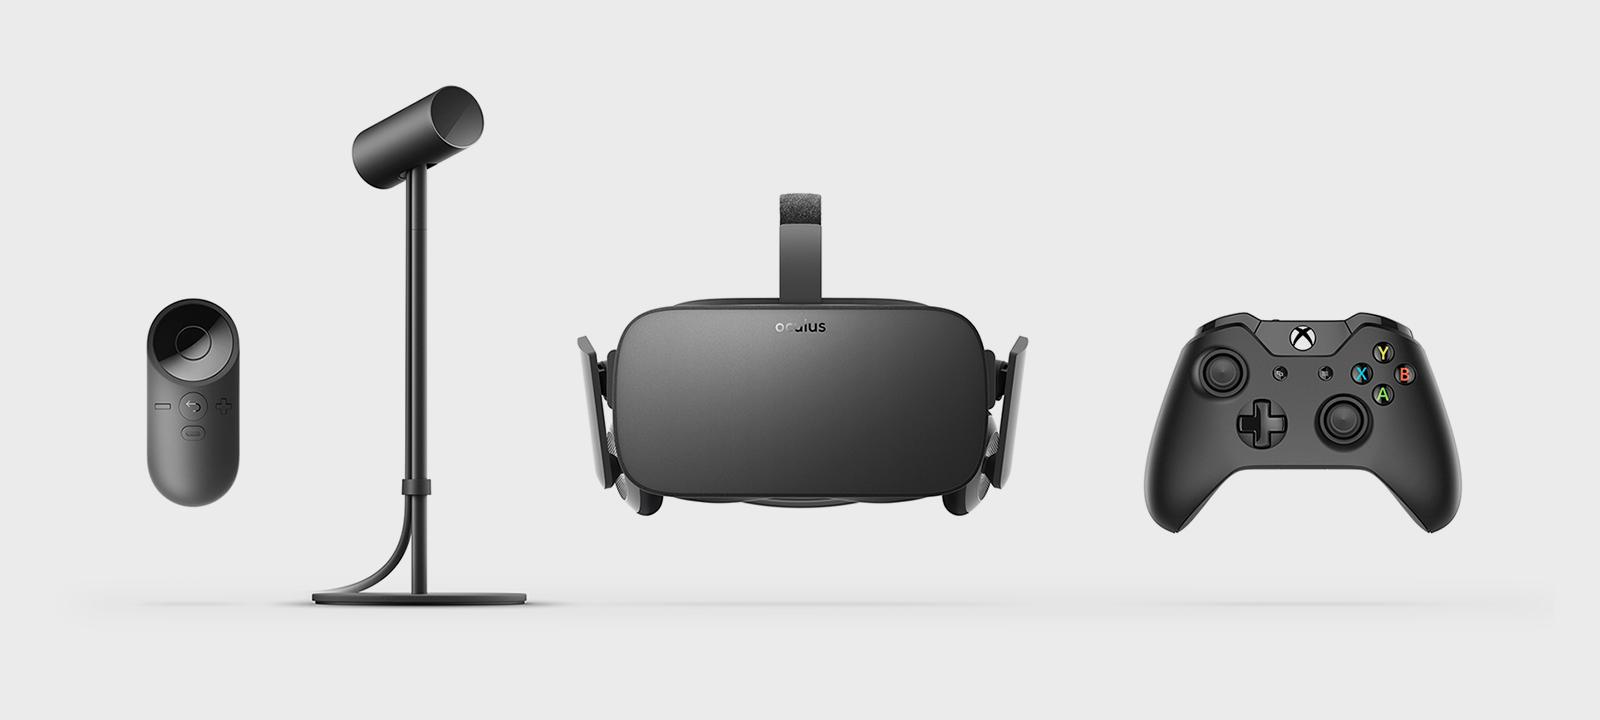 OculusRift情報まとめ!価格・付属品に購入方法からレビュー・口コミなど徹底紹介